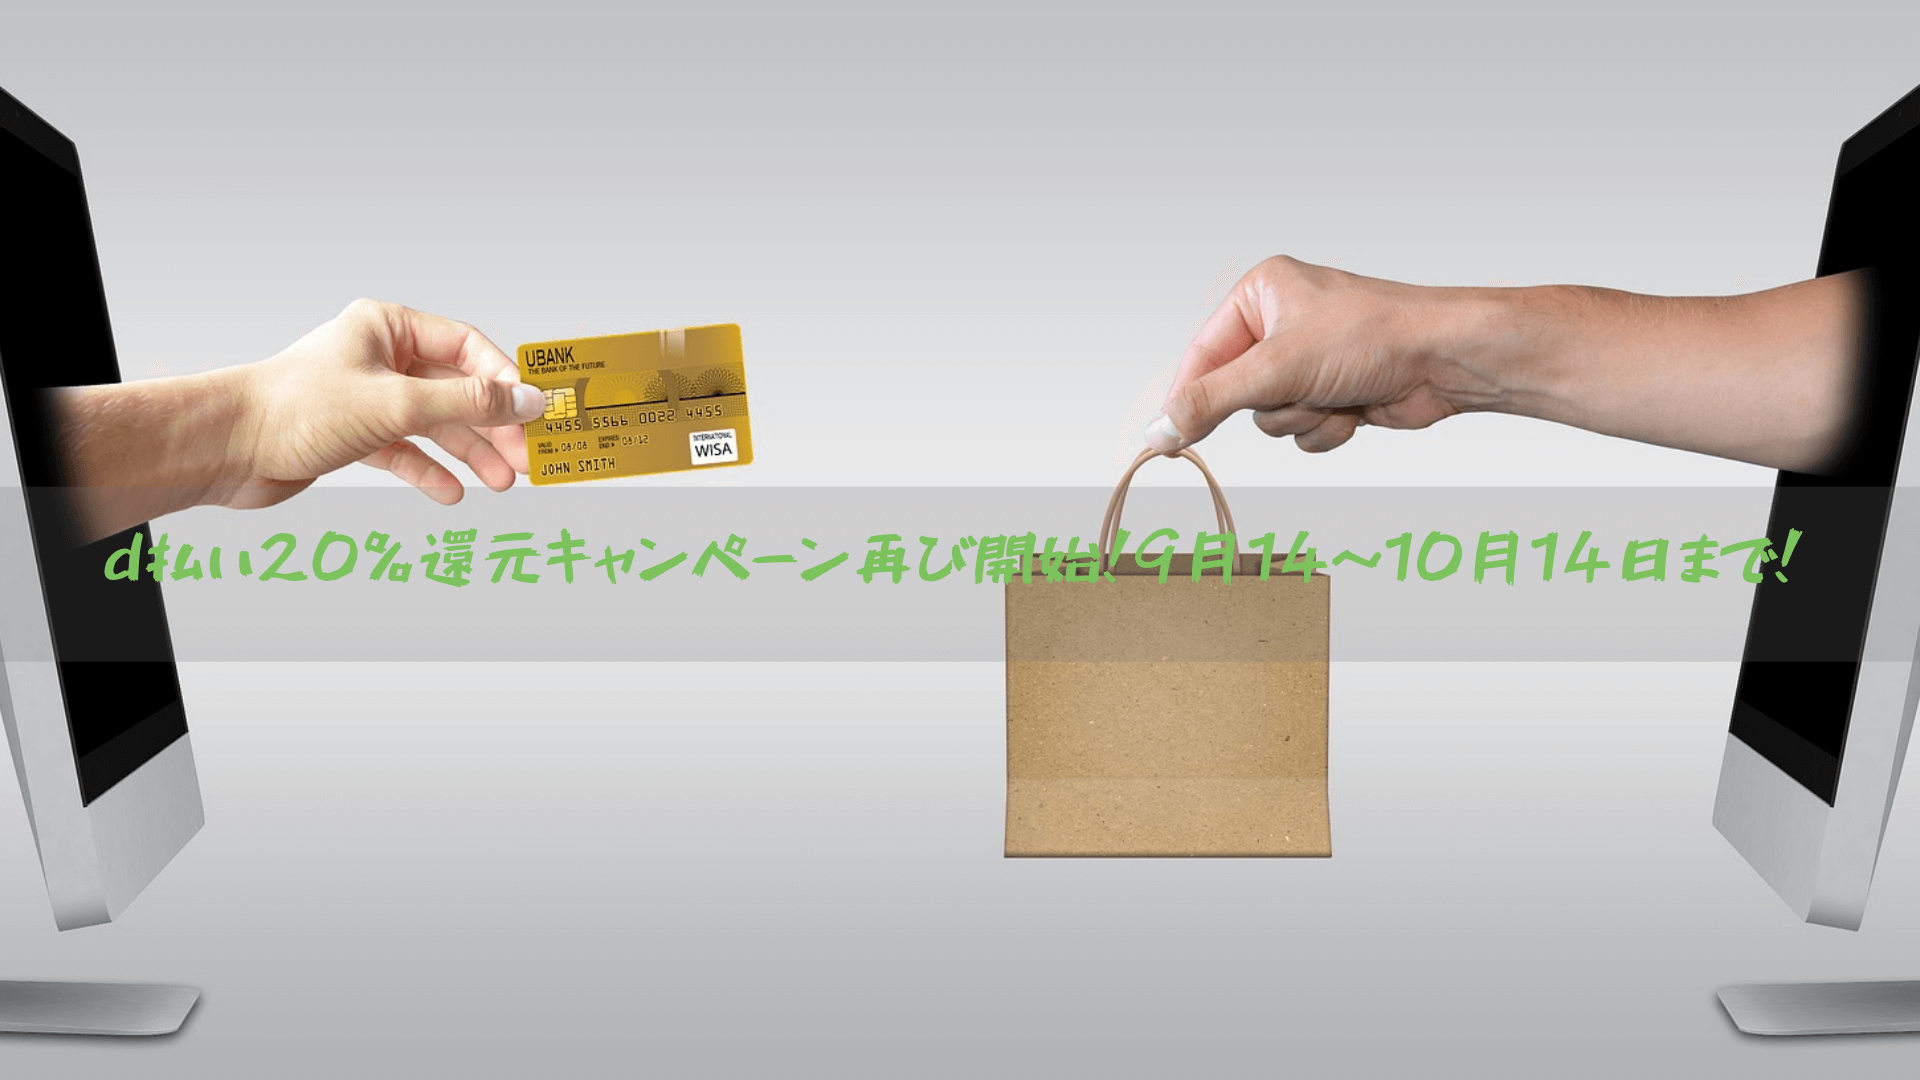 d払い20%還元キャンペーン再び開始!9月14~10月14日まで!